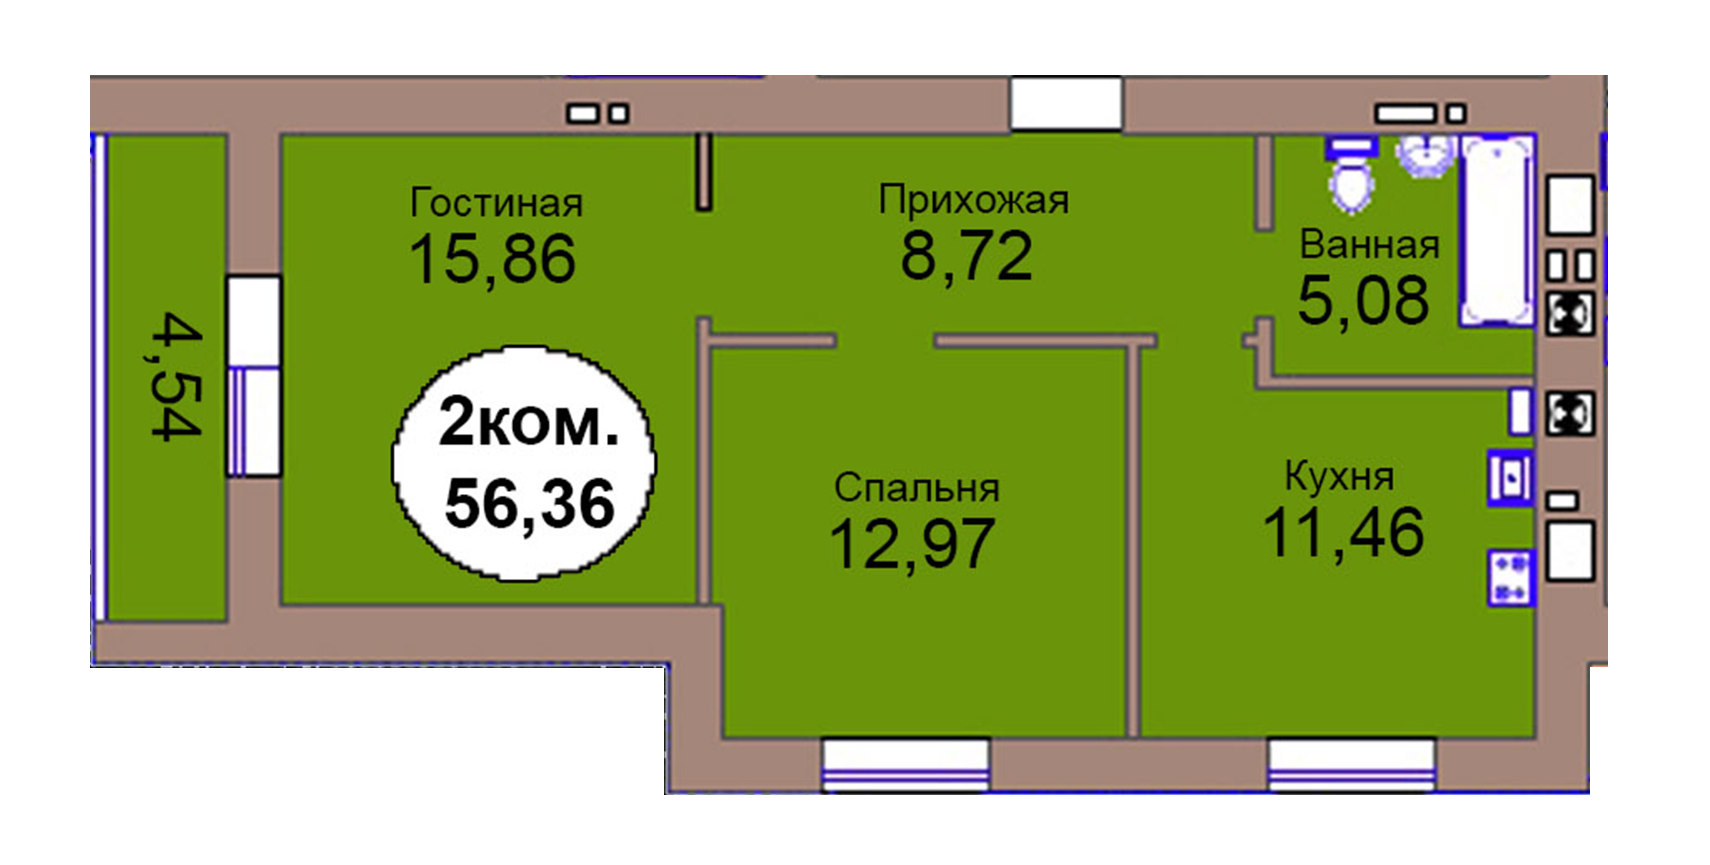 2-комн. кв. по пер. Калининградский, 4  кв. 92 в Калининграде